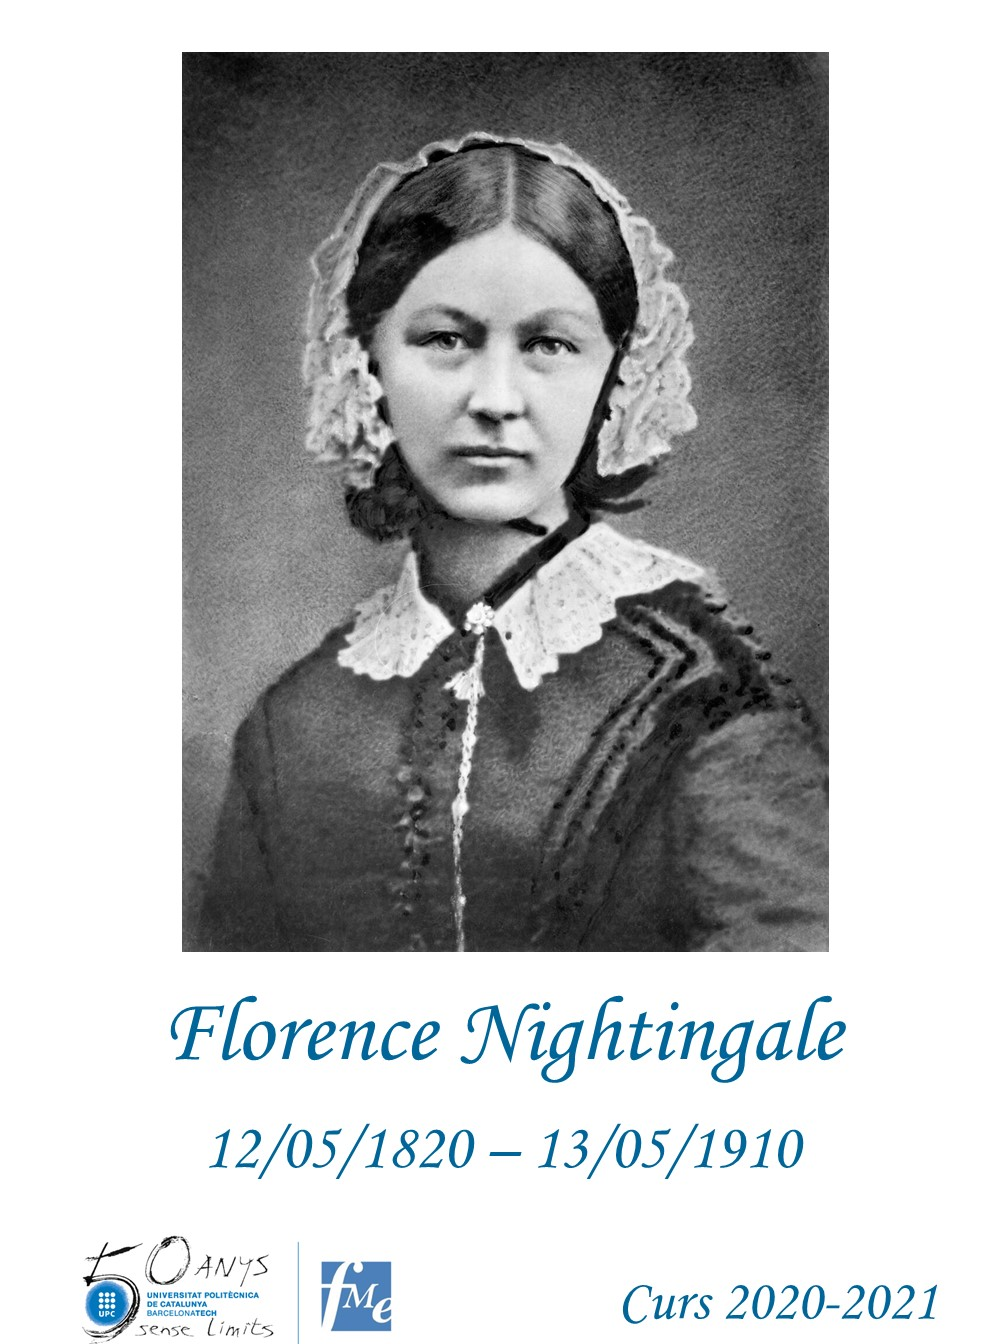 18_Nightingale_2020_2021.jpg